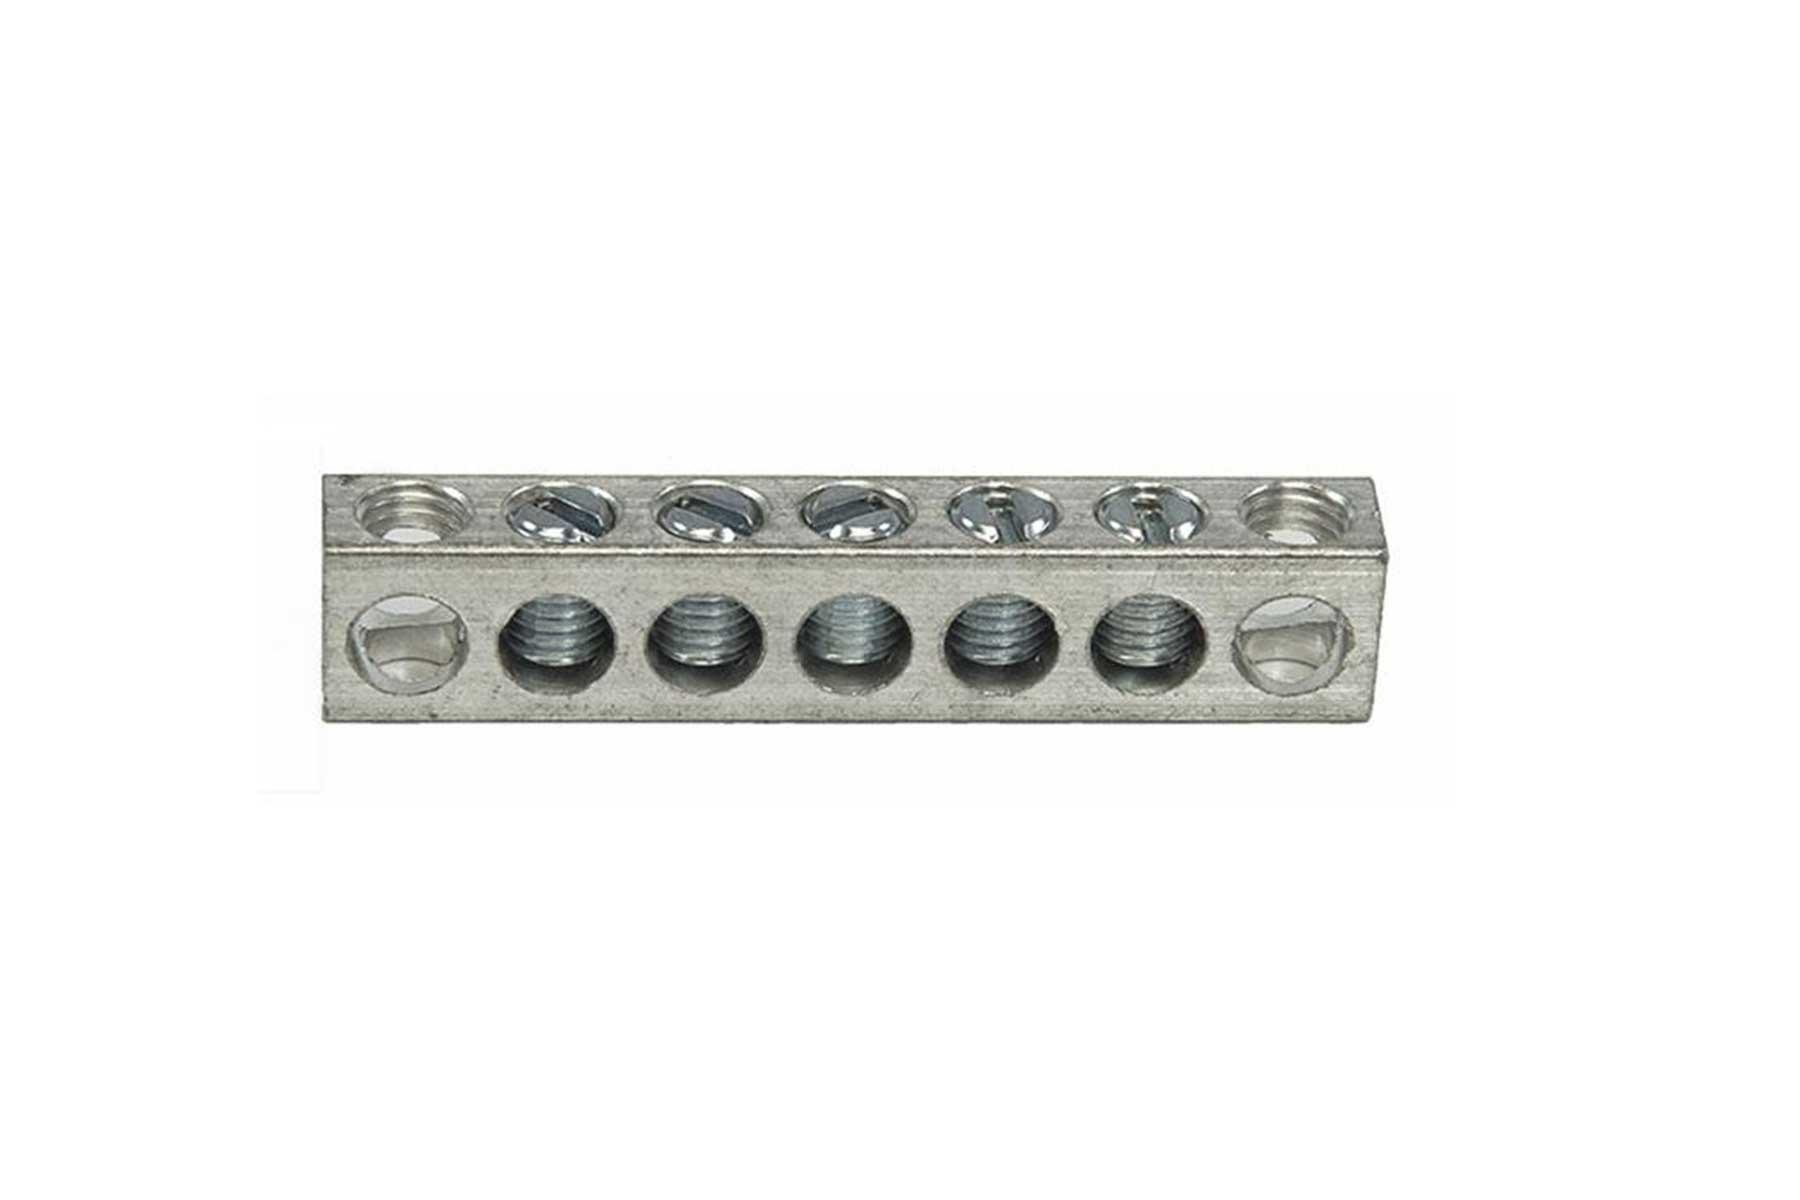 Aluminum Neutral Bar - 4 Taps - 2 Holes